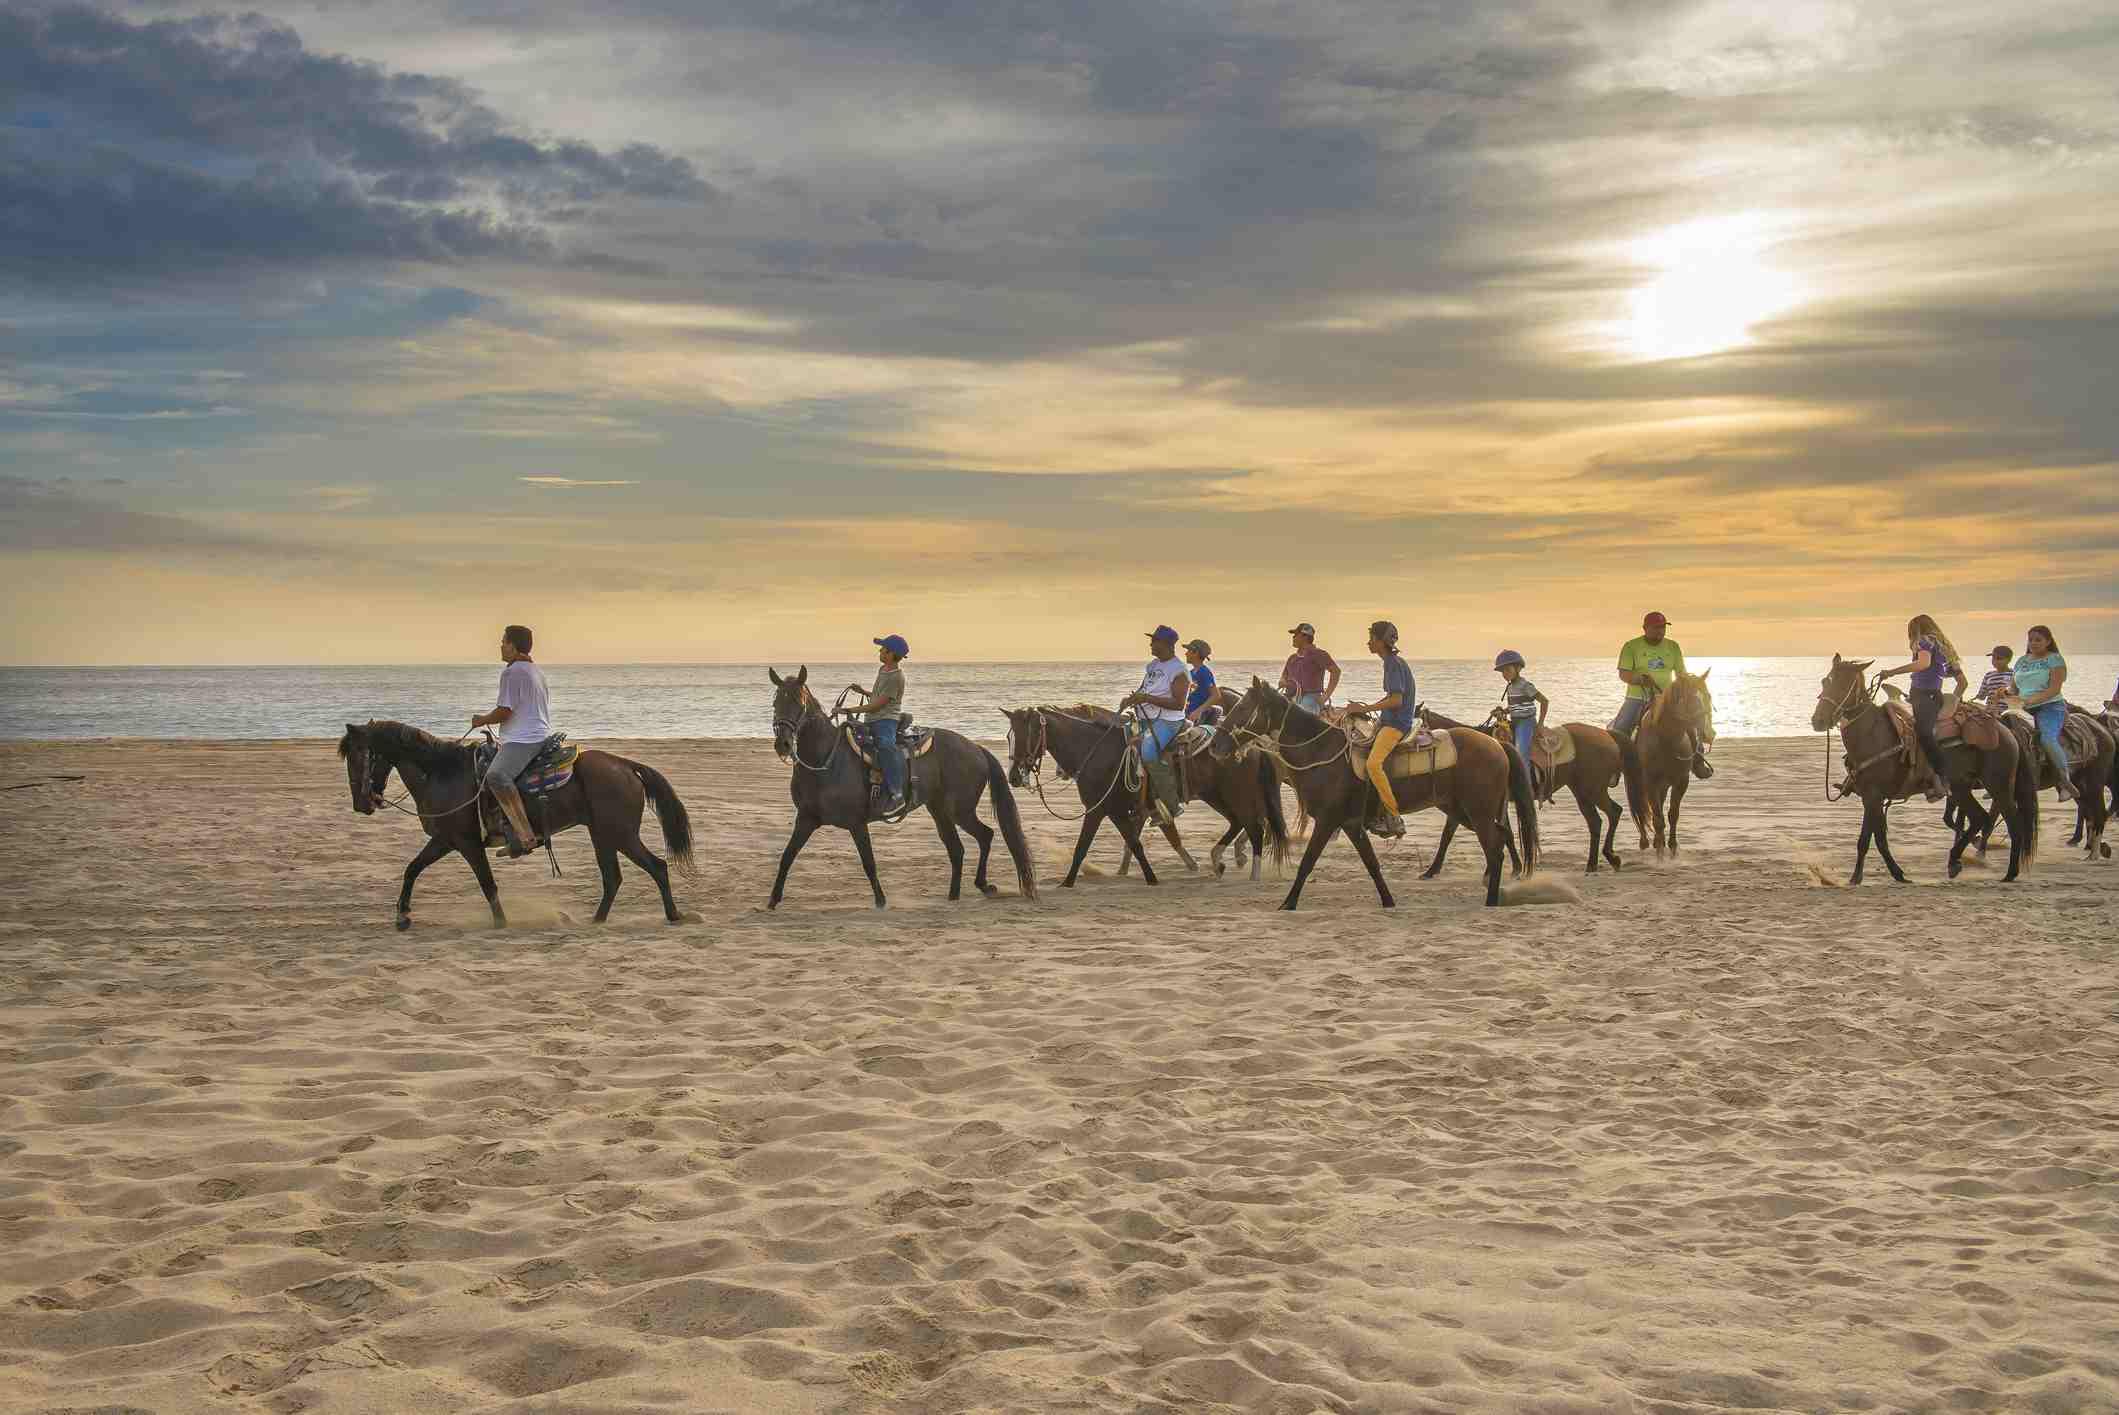 Summertime in PUNTA LOBOS Beach, local people riding horses, Todos Santos, Baja California Sur. MEXICO